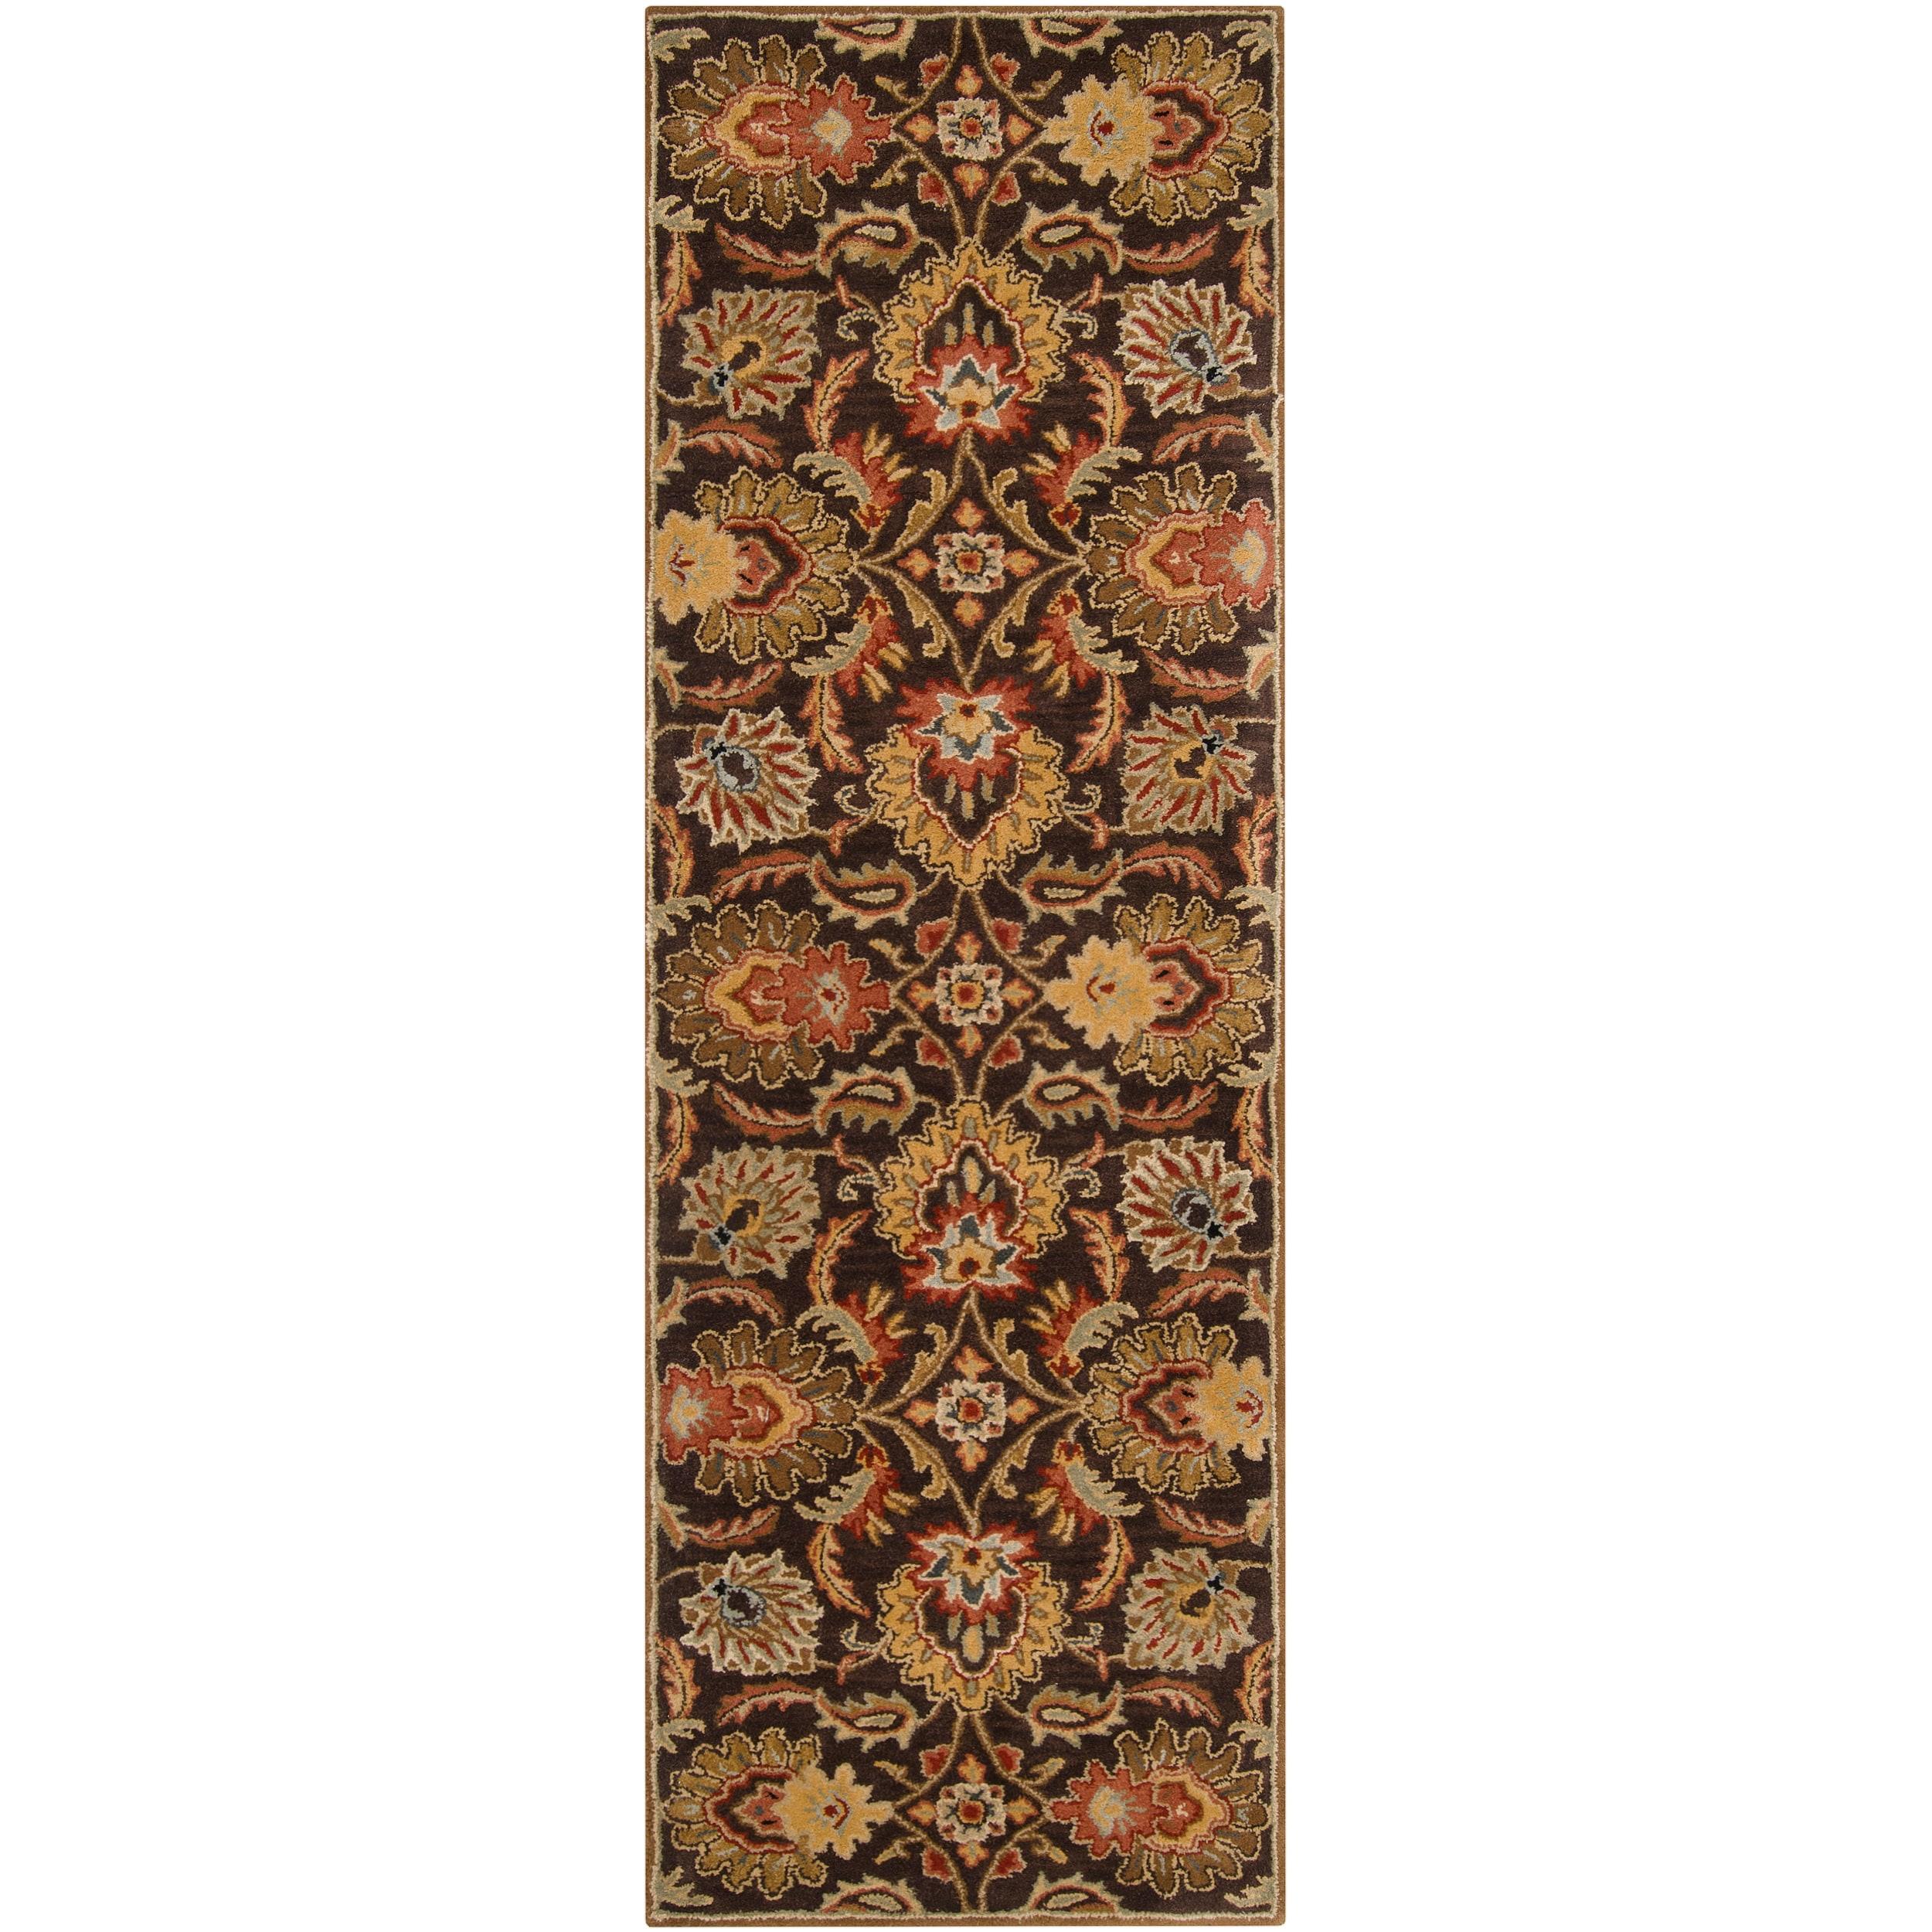 Hand-tufted Alafia Chocolate Brown Floral Wool Rug (2'6 x 8')